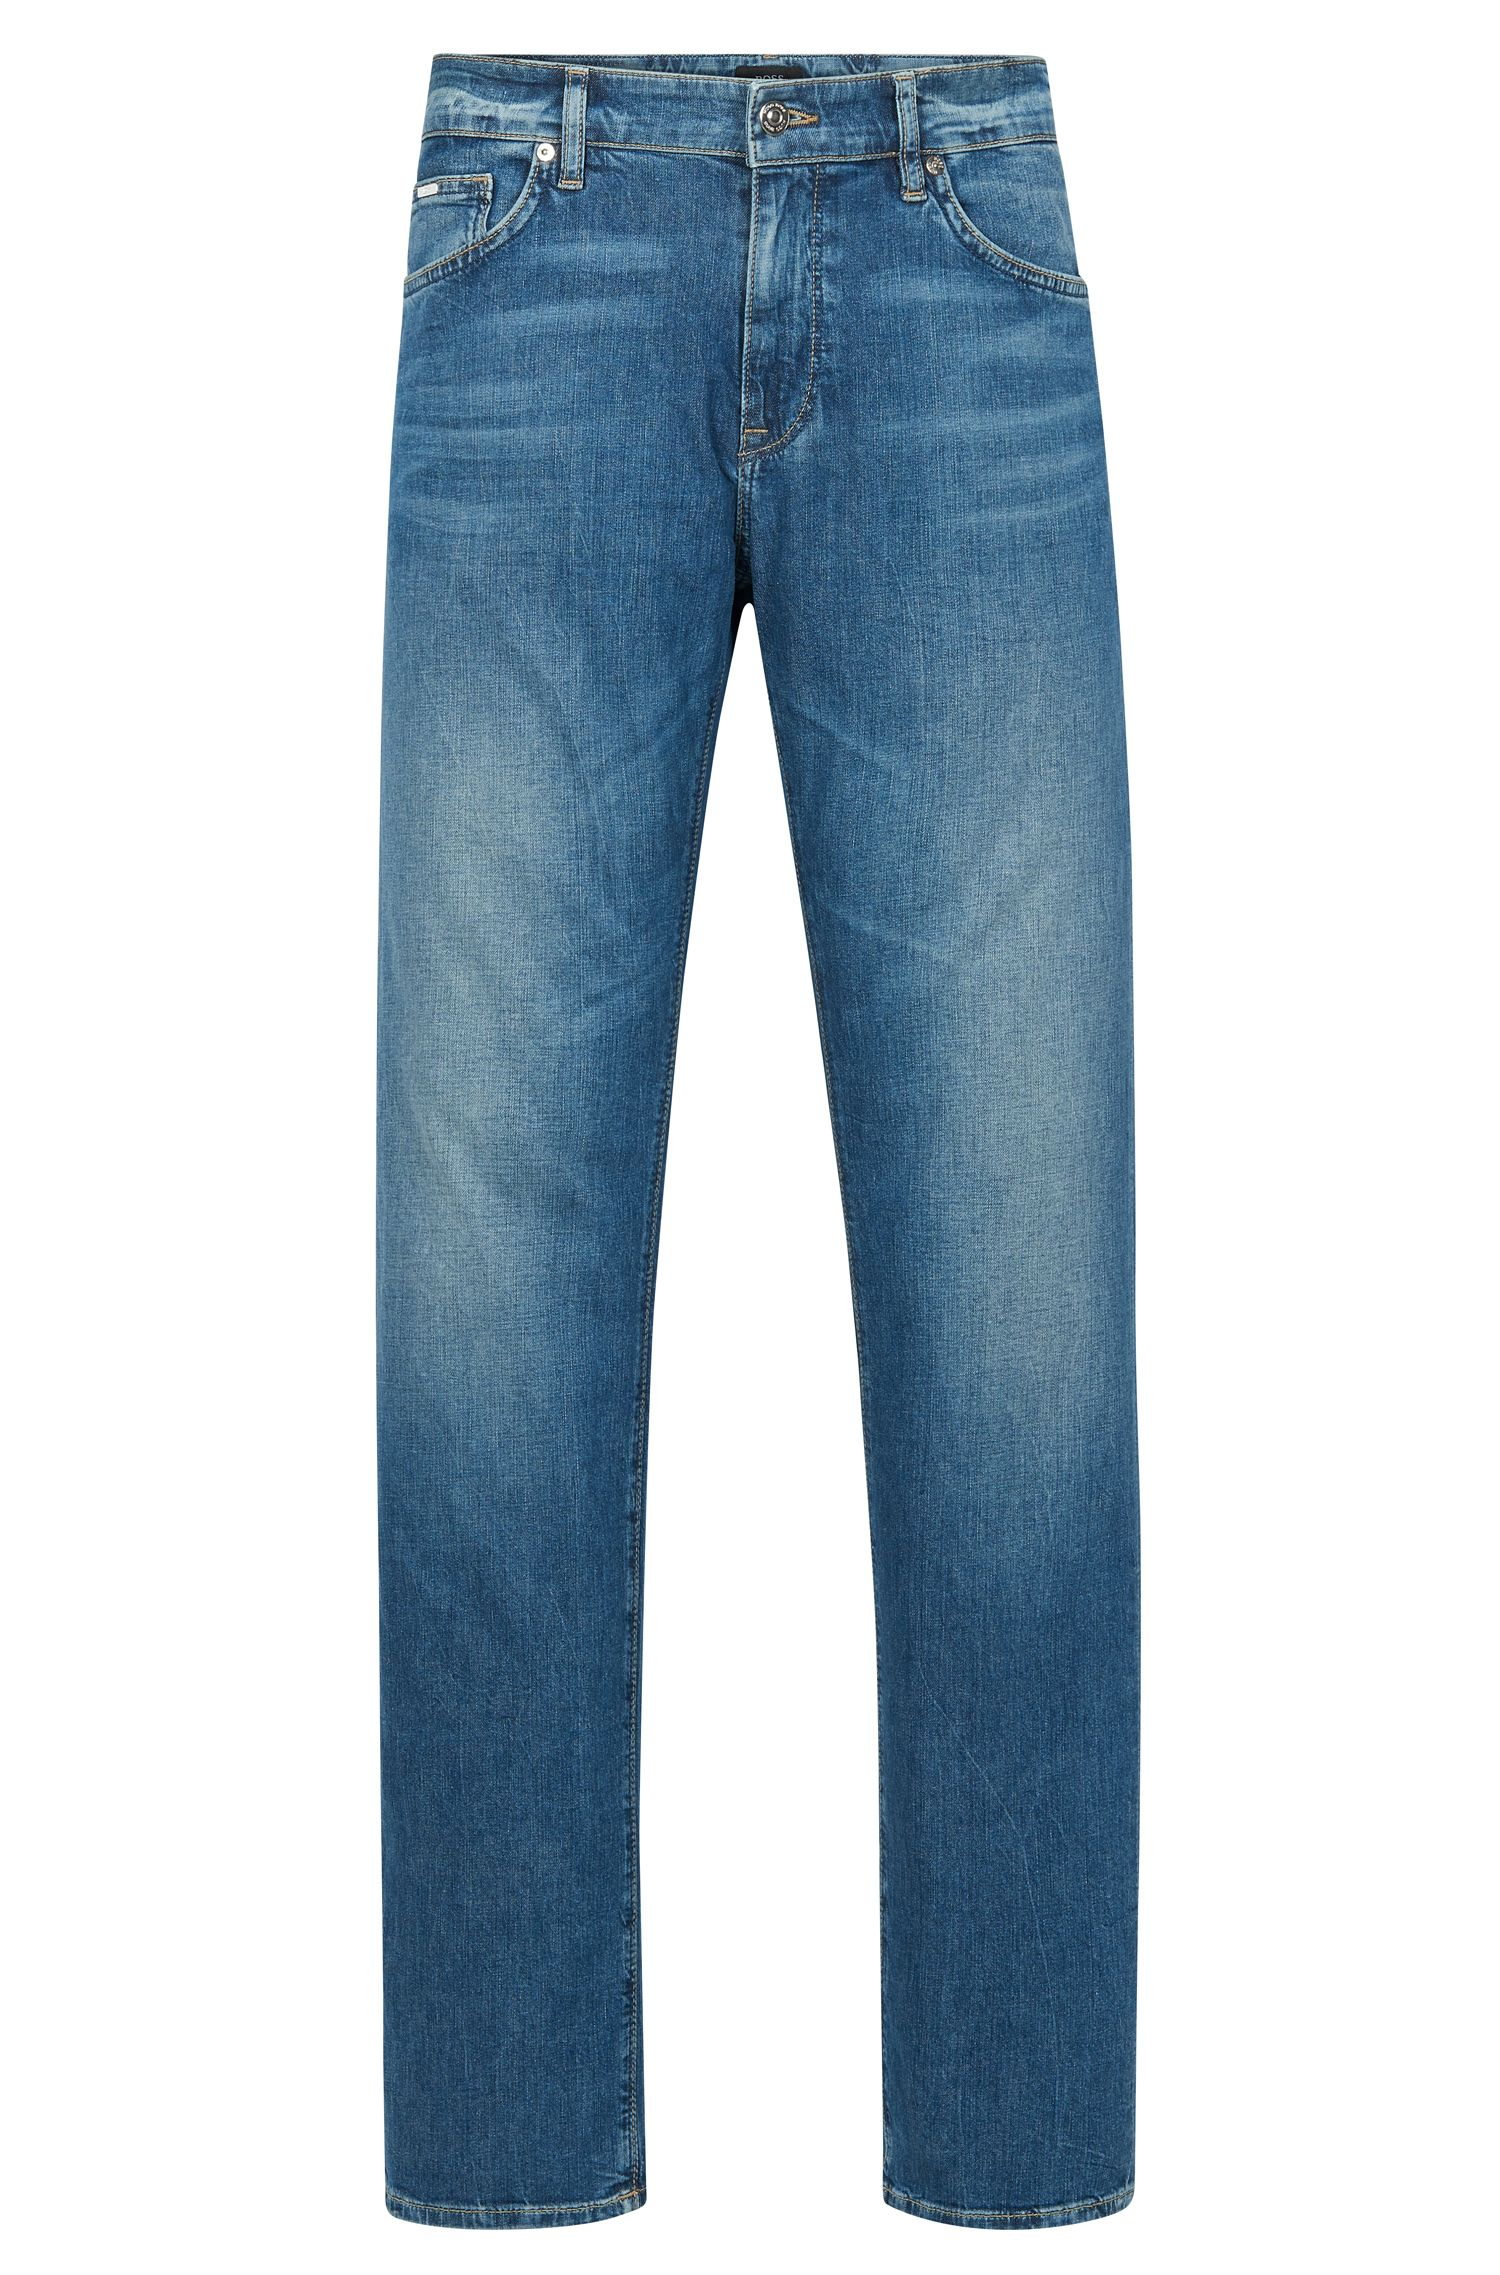 9 oz Stretch Cotton Jeans, Regular Fit | Maine